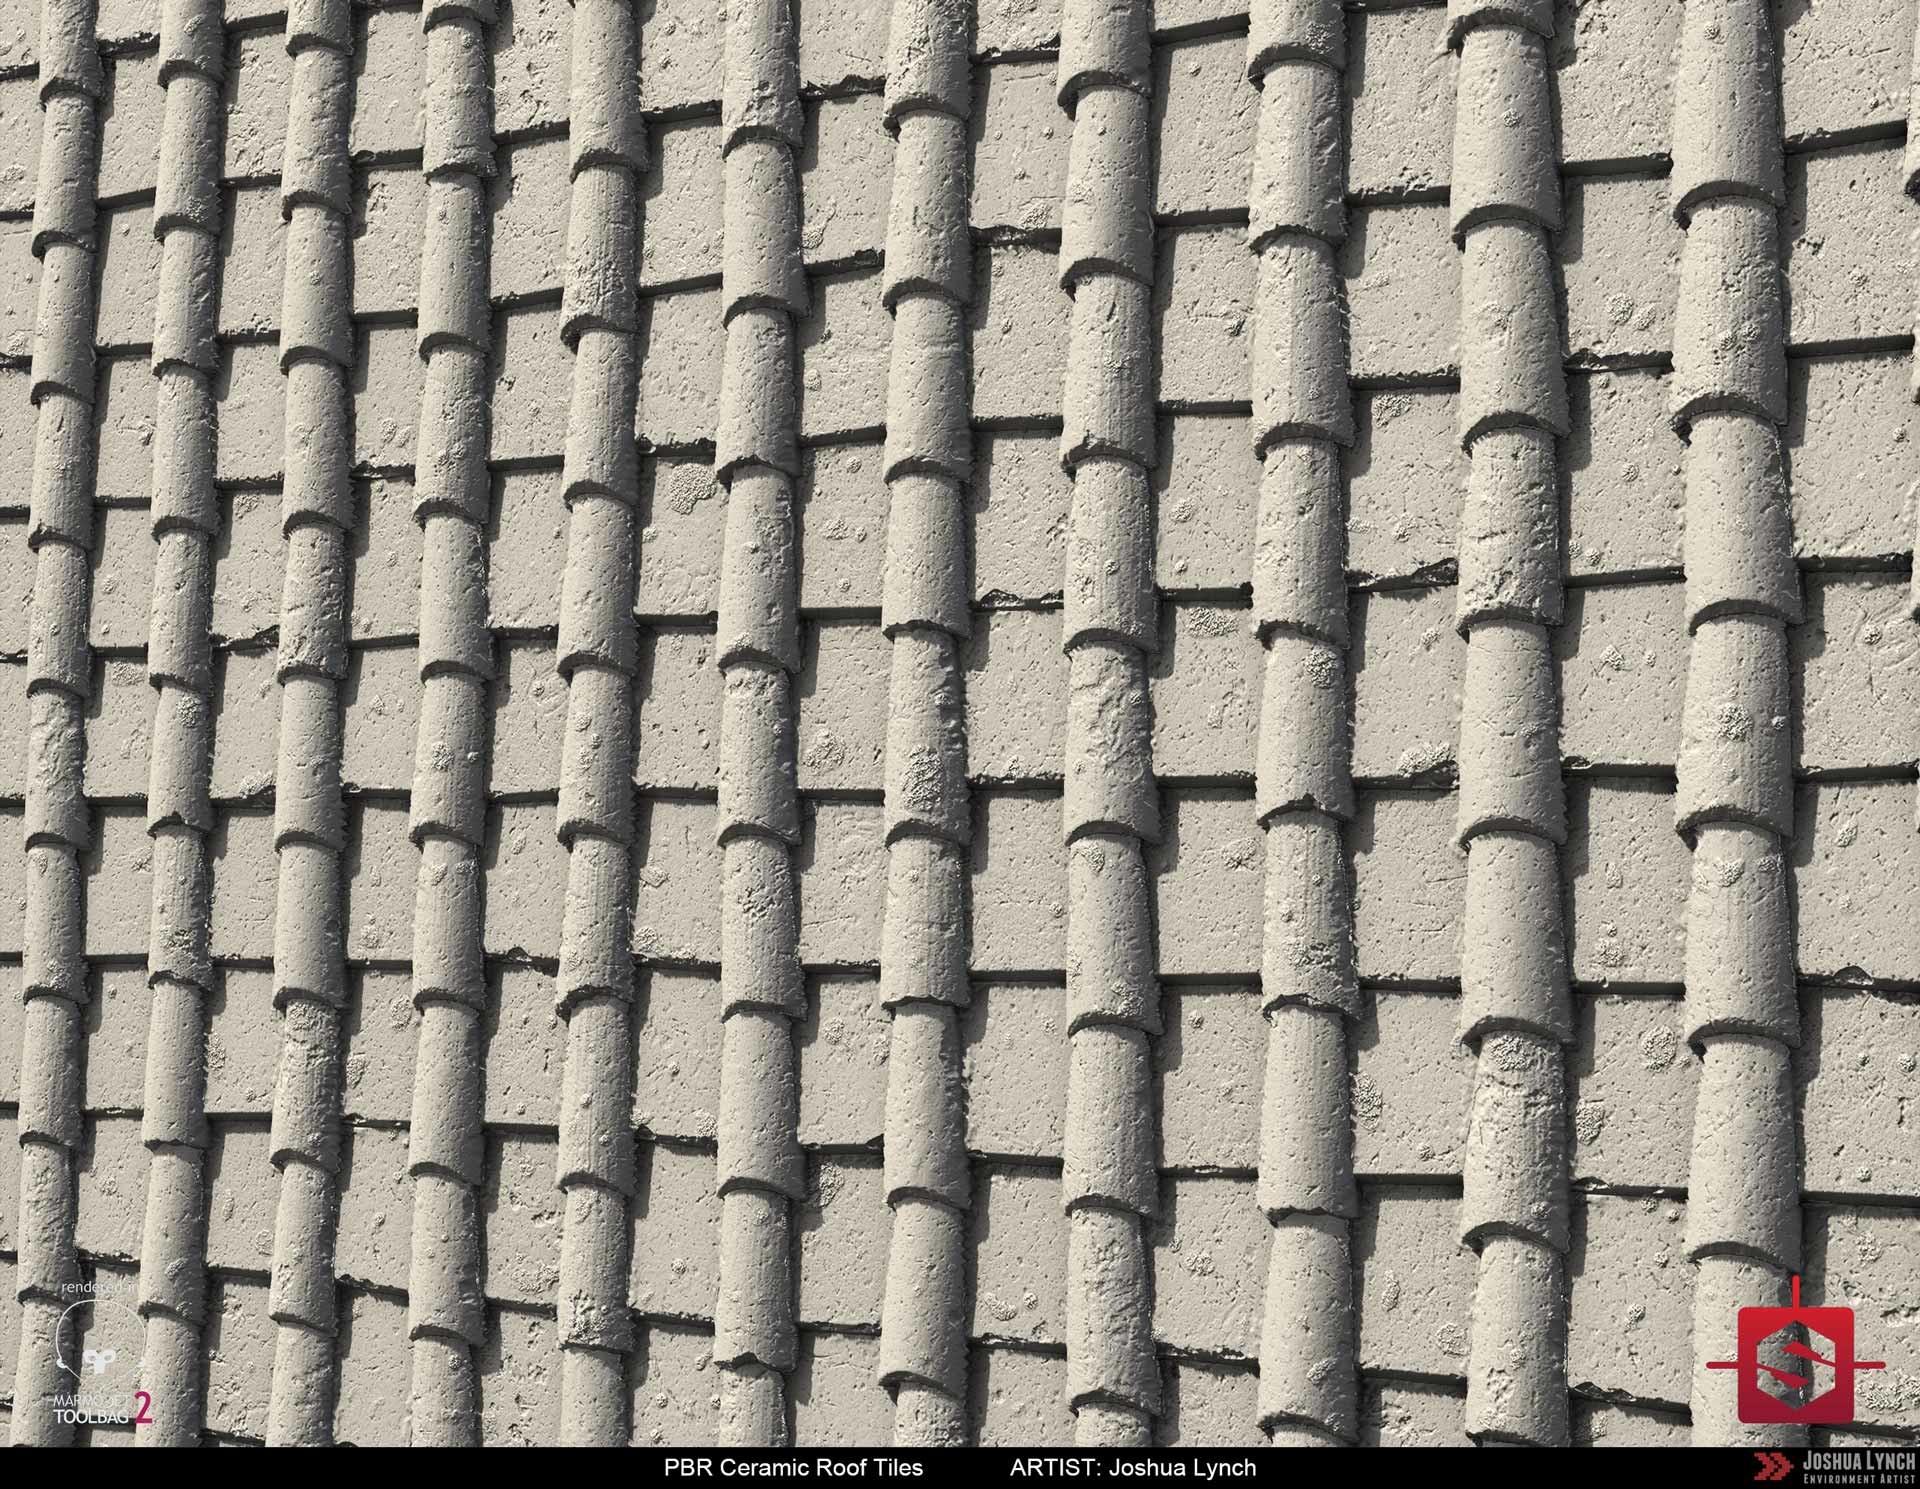 Joshua lynch roofing tiles 02 wall angle rev 03 gray layout comp josh lynch